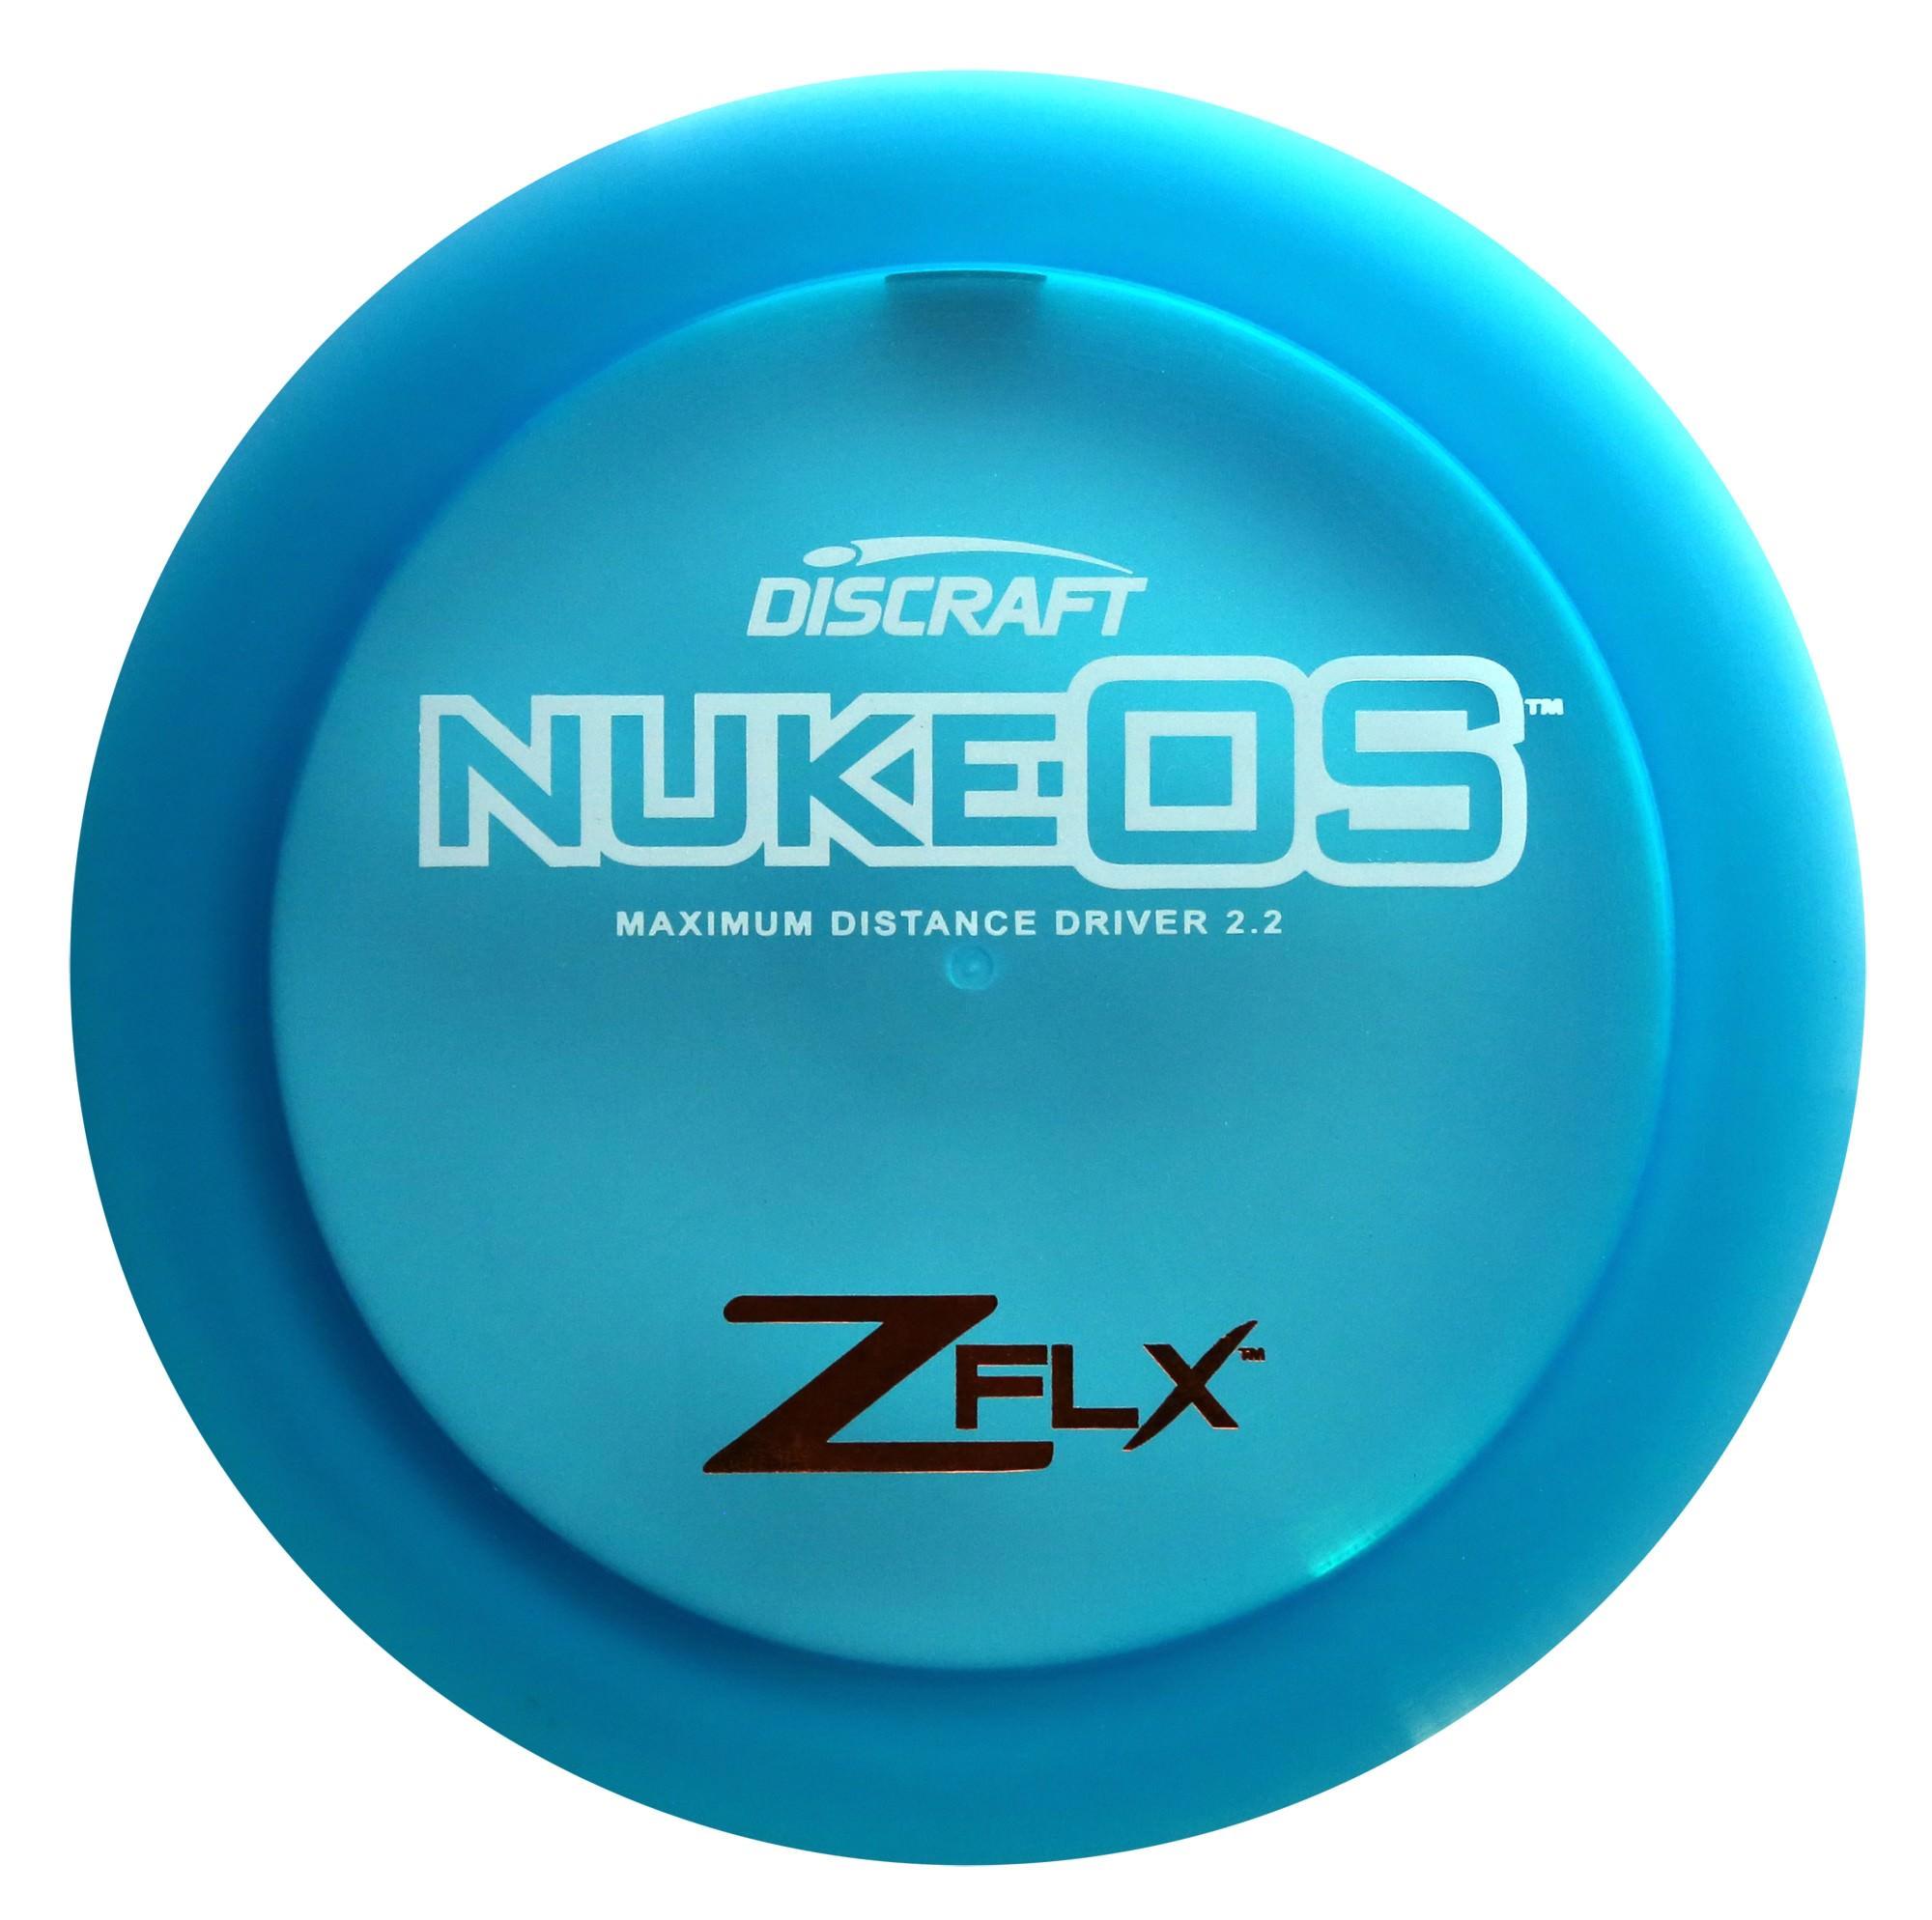 Discraft Z FLX Nuke OS